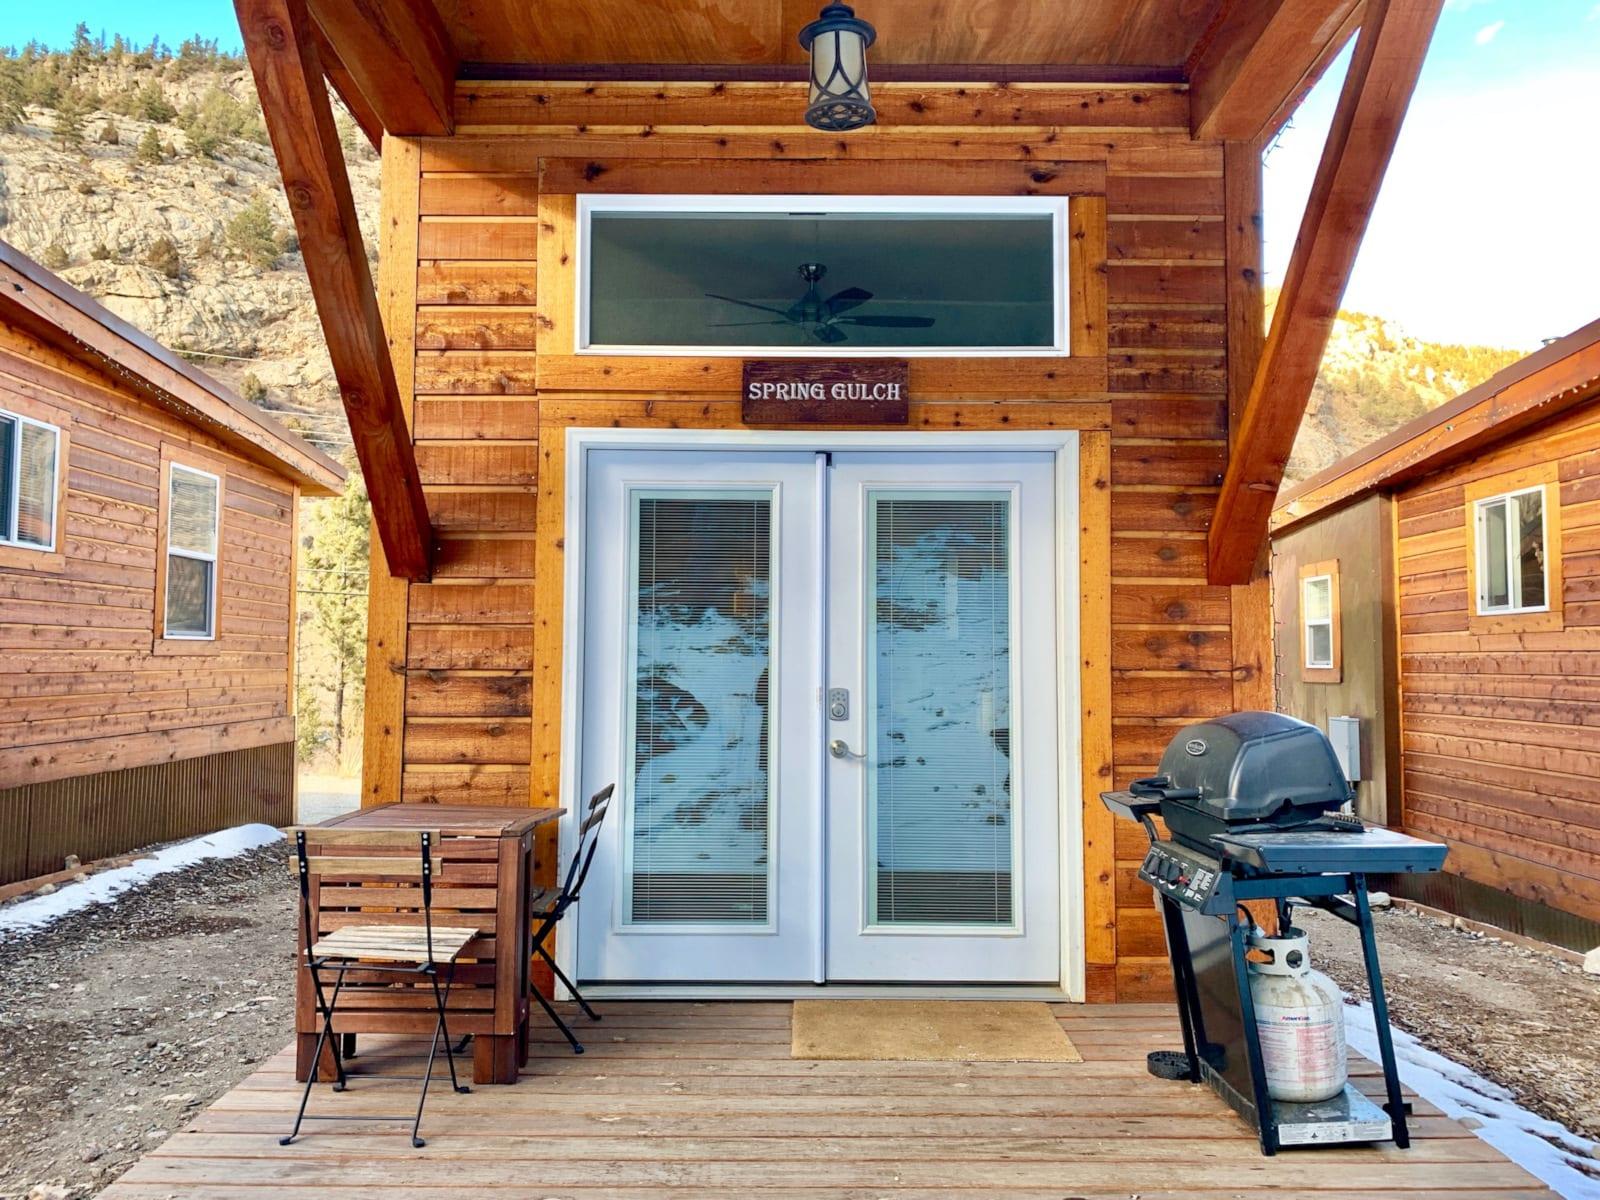 Lawson Adventure Park Resort Cabin